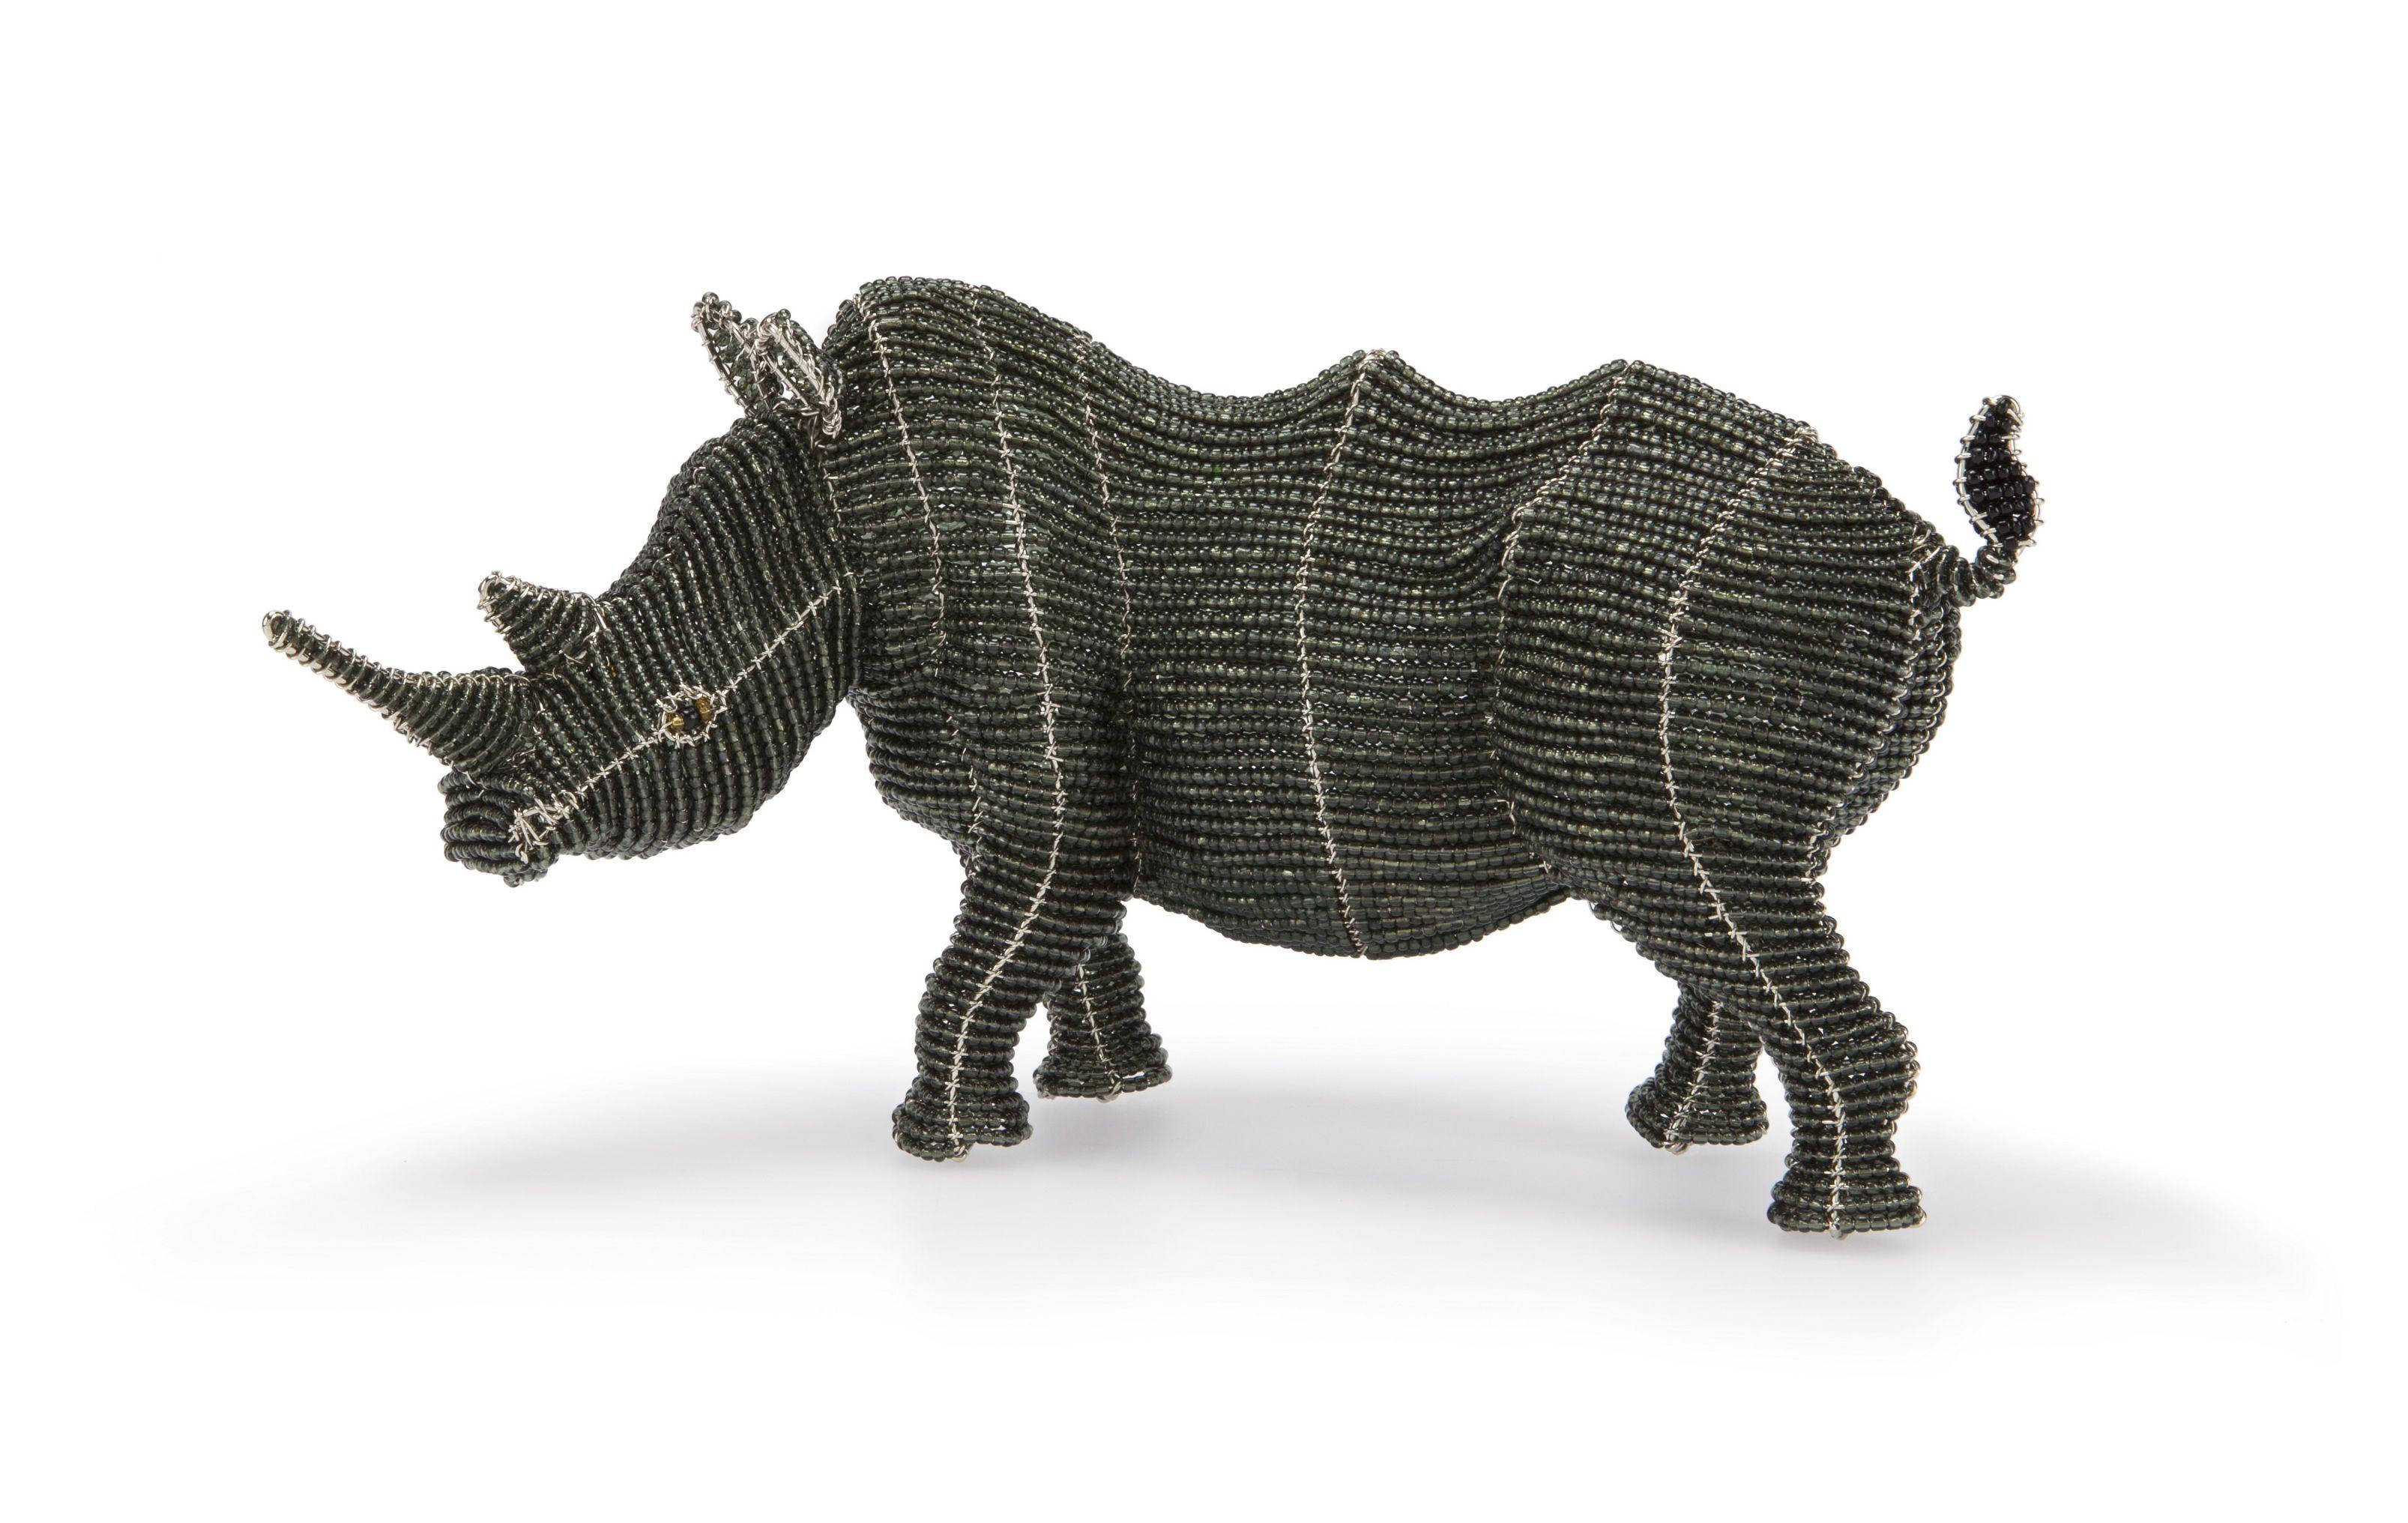 Rhino Figurine | Wire and Bead Art | African Creative